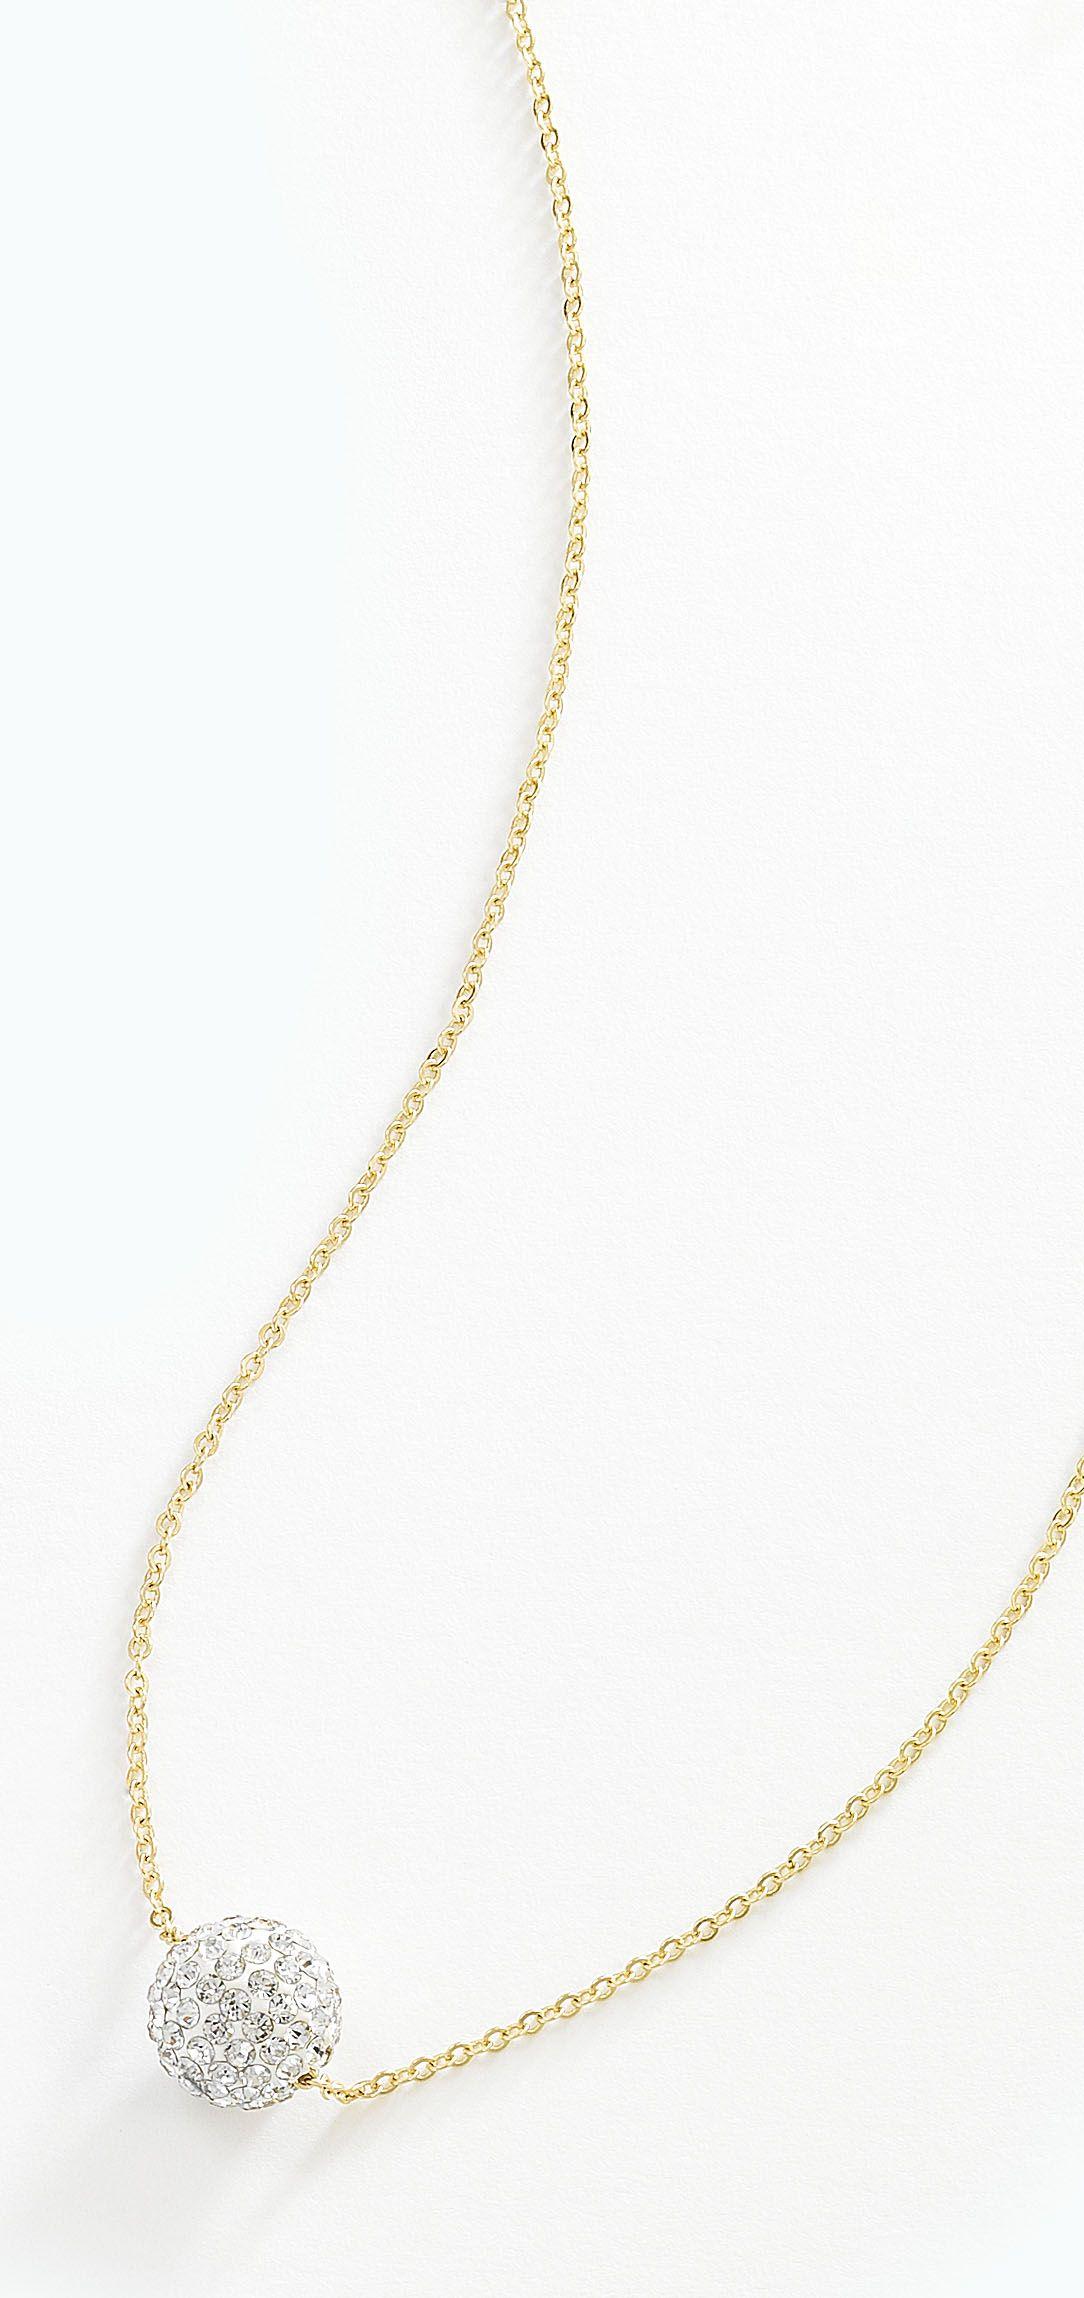 Cadena en 4 ba os de oro de 18 kl con dije de esfera for Banos electroliticos para joyeria